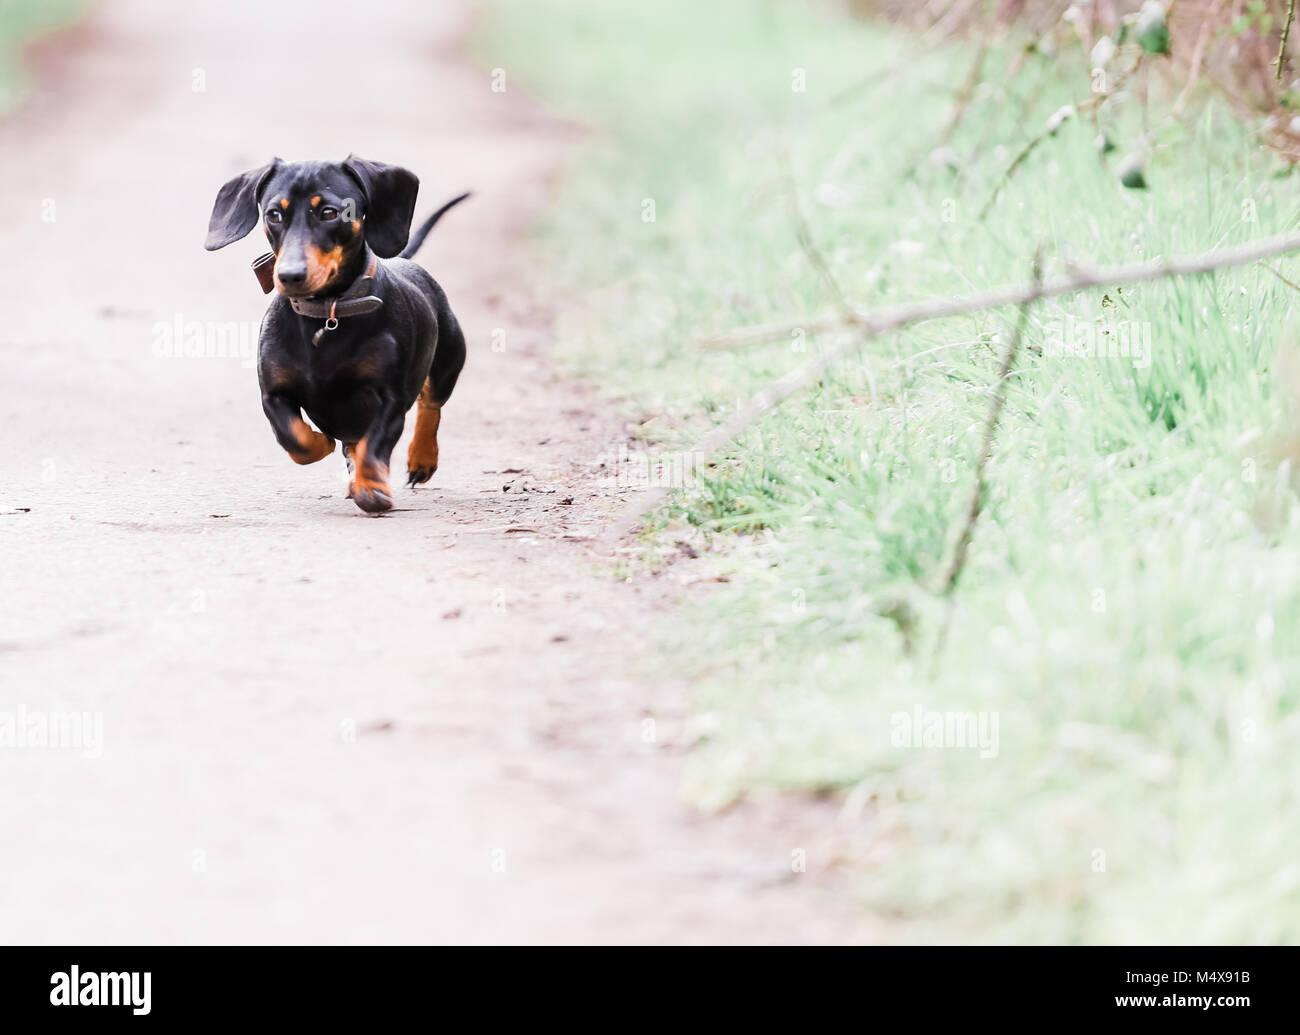 Black Sausage Dog Stock Photos & Black Sausage Dog Stock Images - Alamy